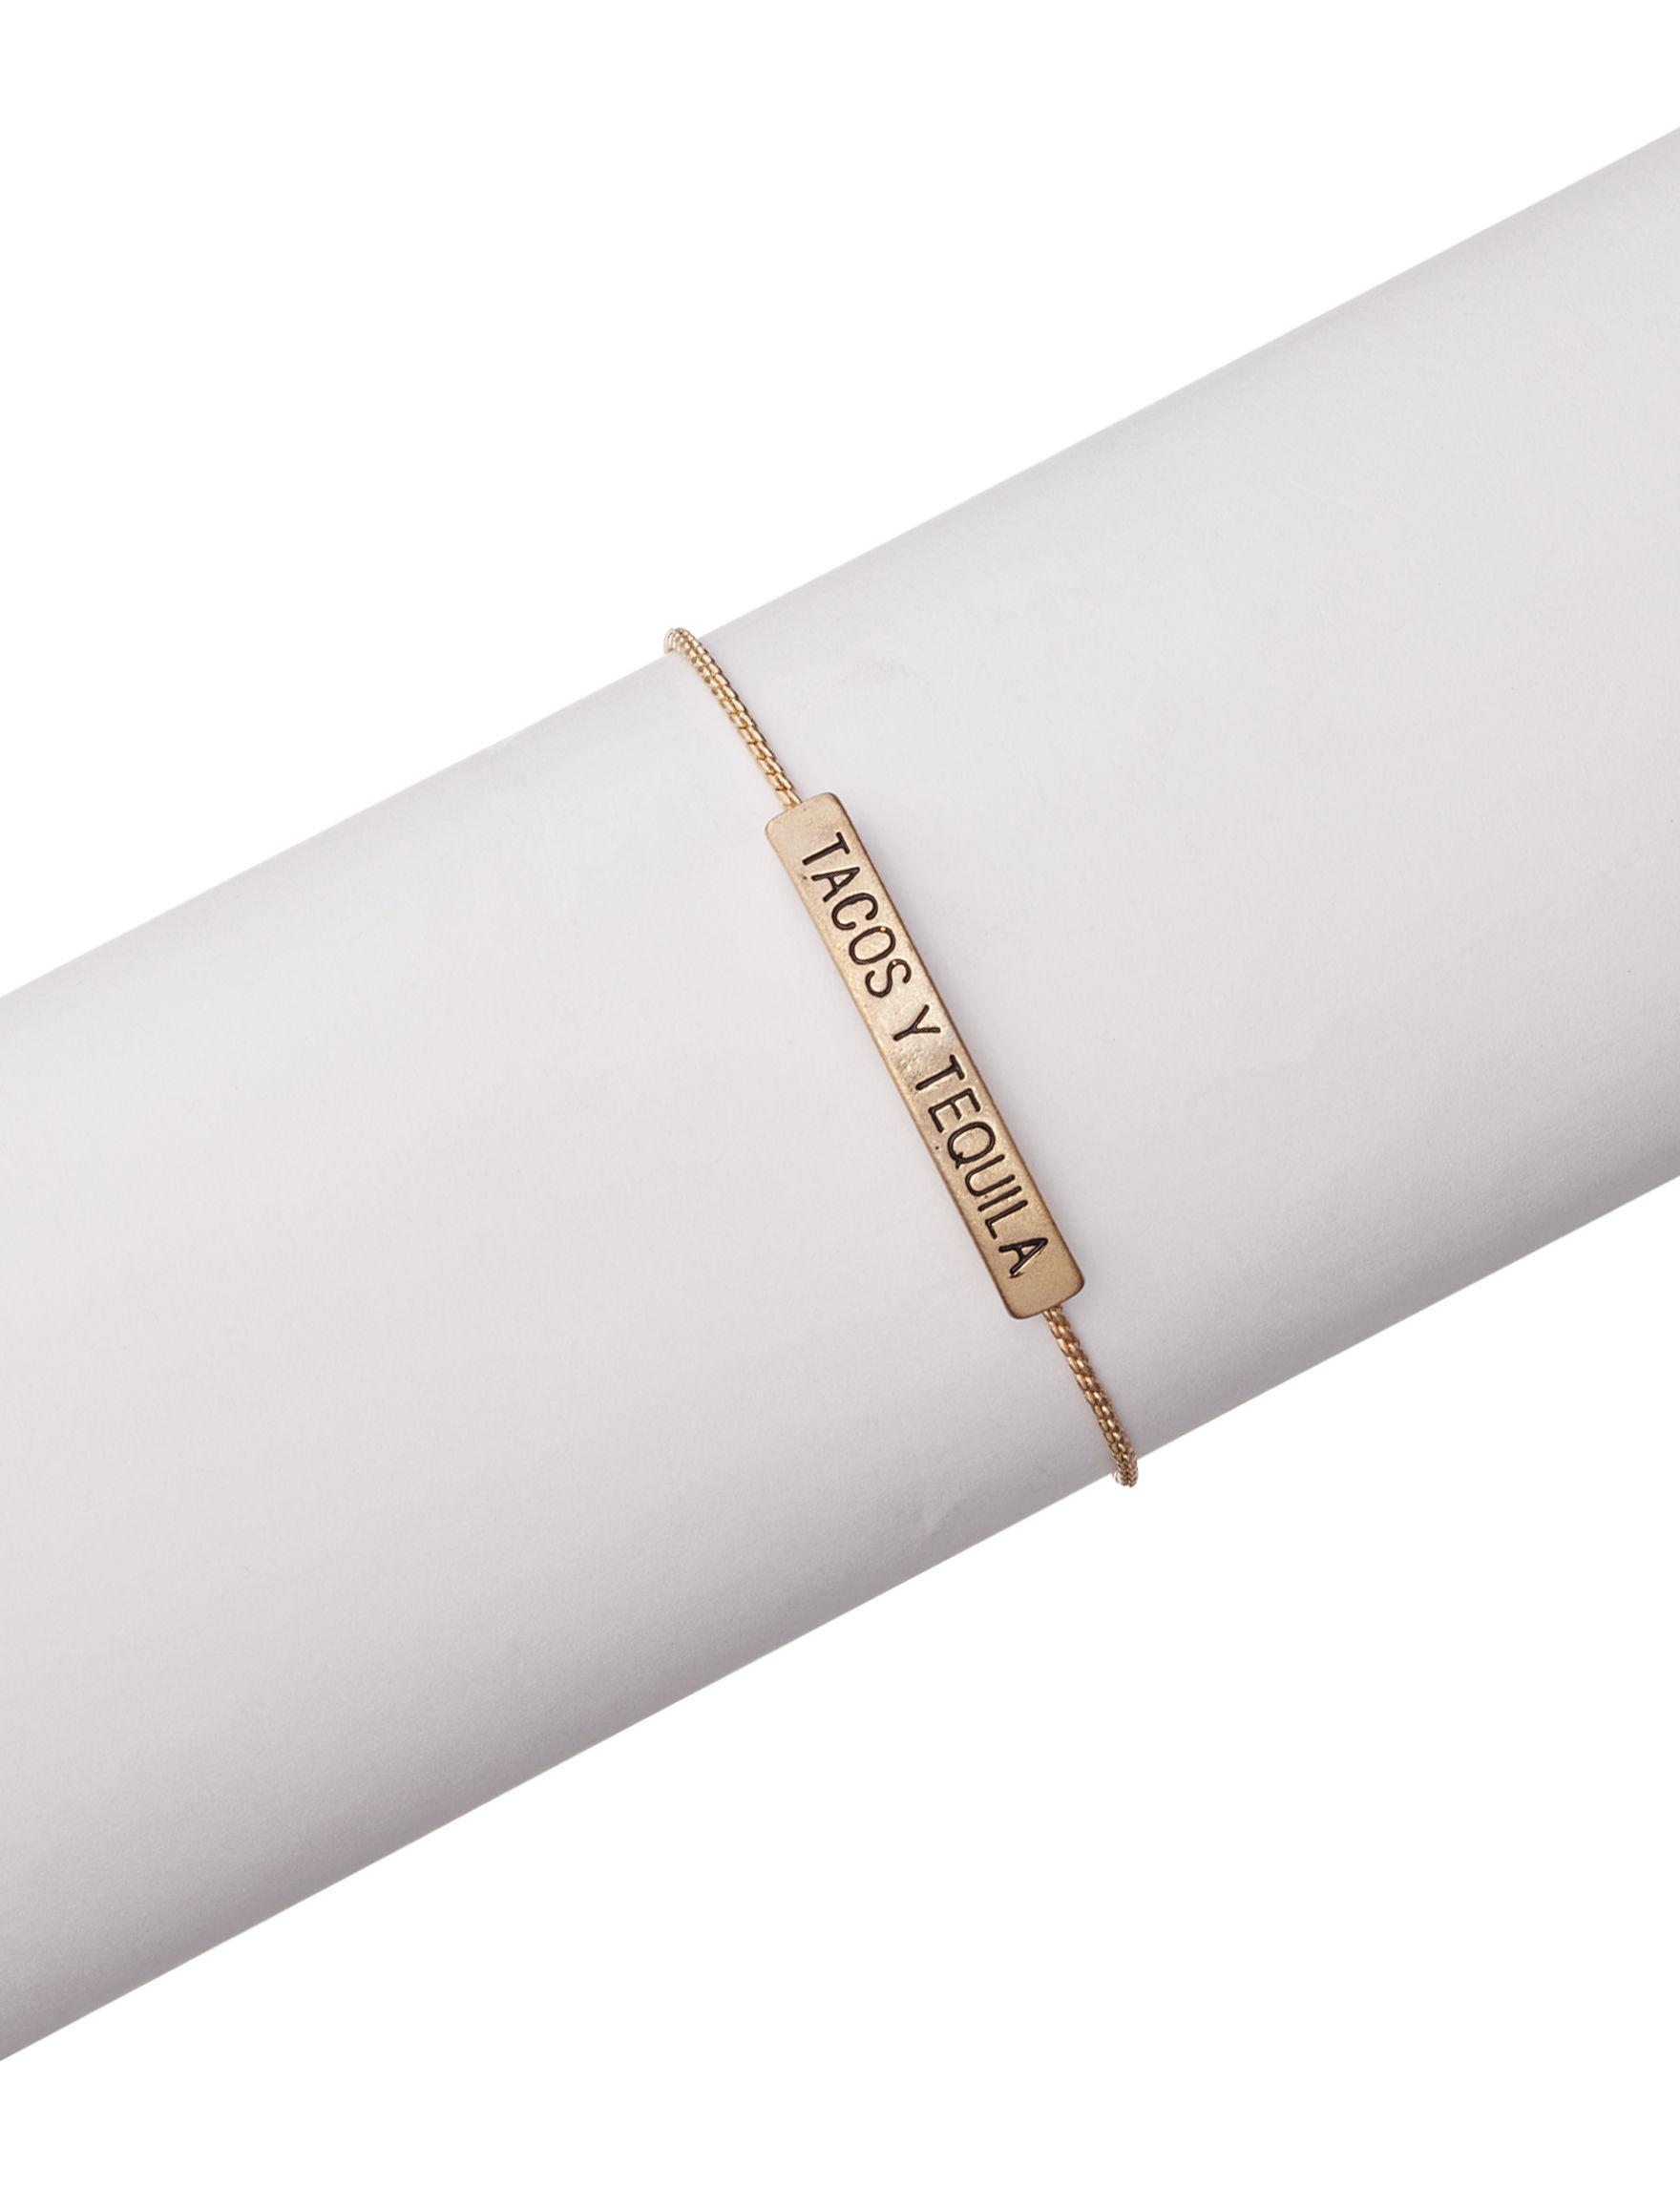 Tanya Silver / Gold Bracelets Fashion Jewelry